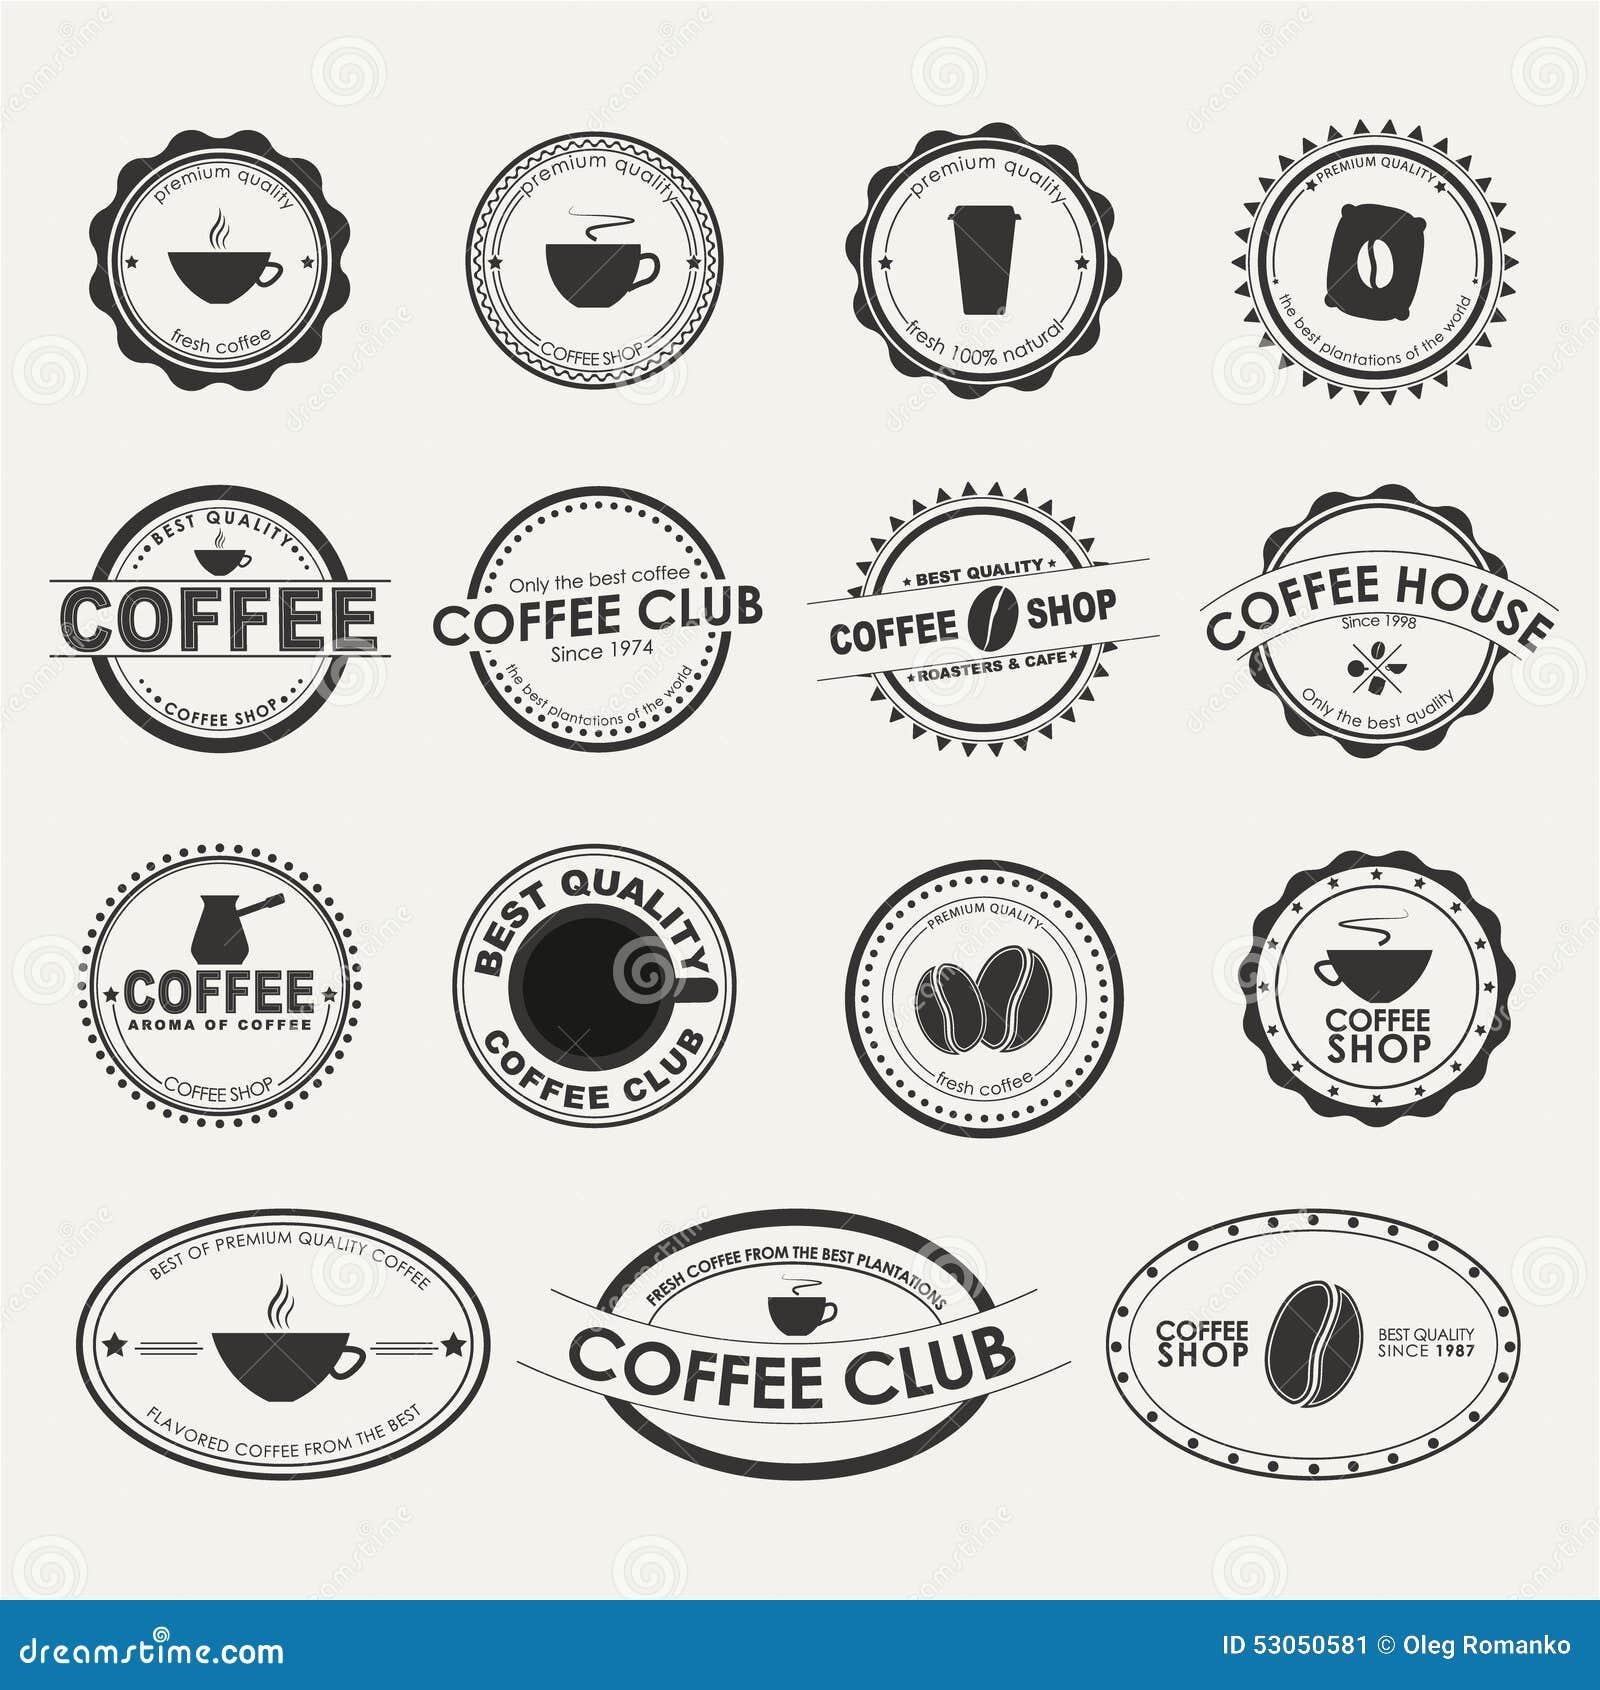 Art logo logo s coffee logo coffee shop coffee design shop logo coffee - Business Coffee Design Element Logo